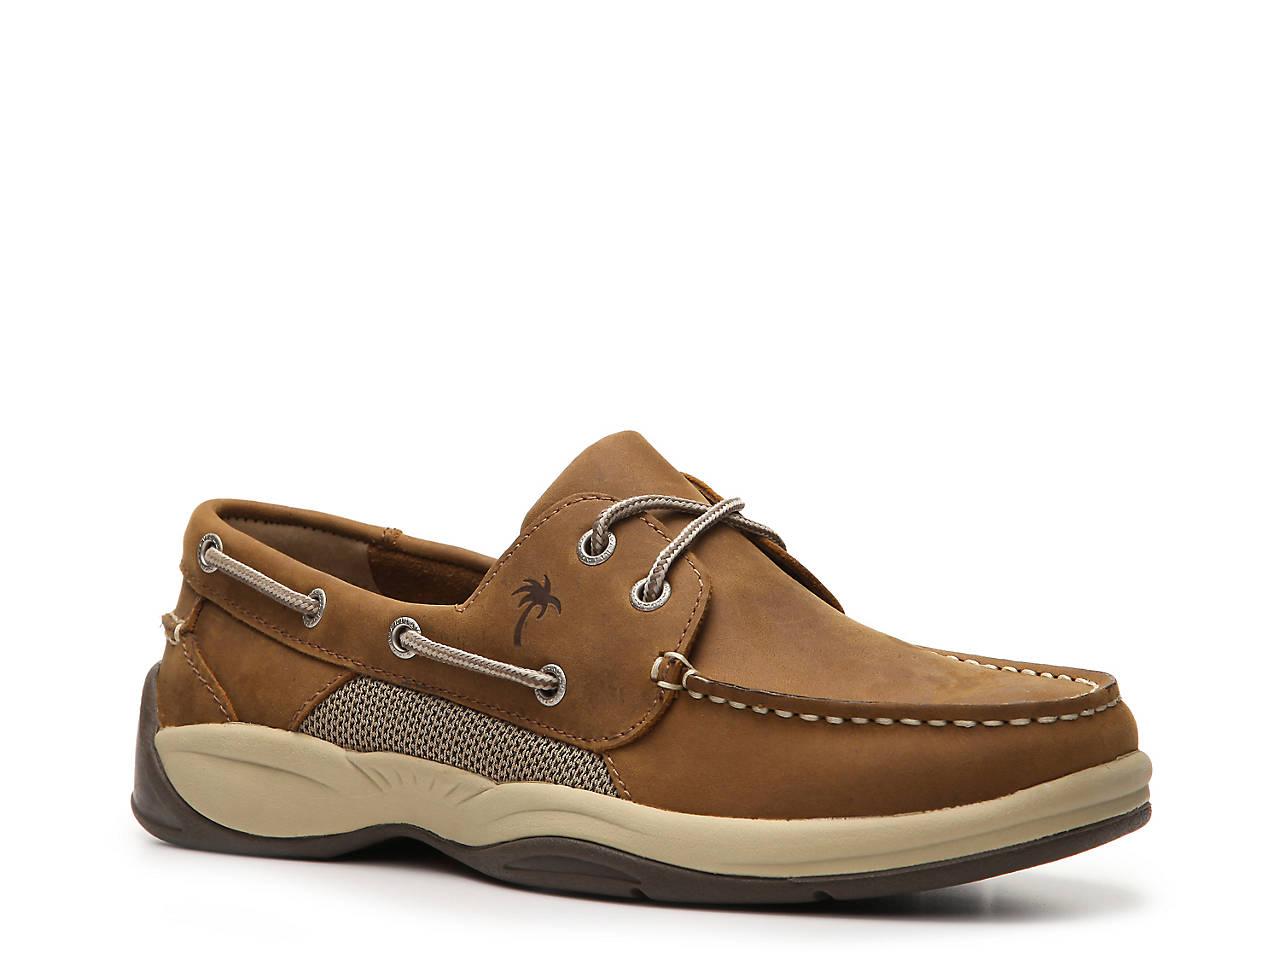 Margaritaville Boat Shoe Beige Tan Angler Mens